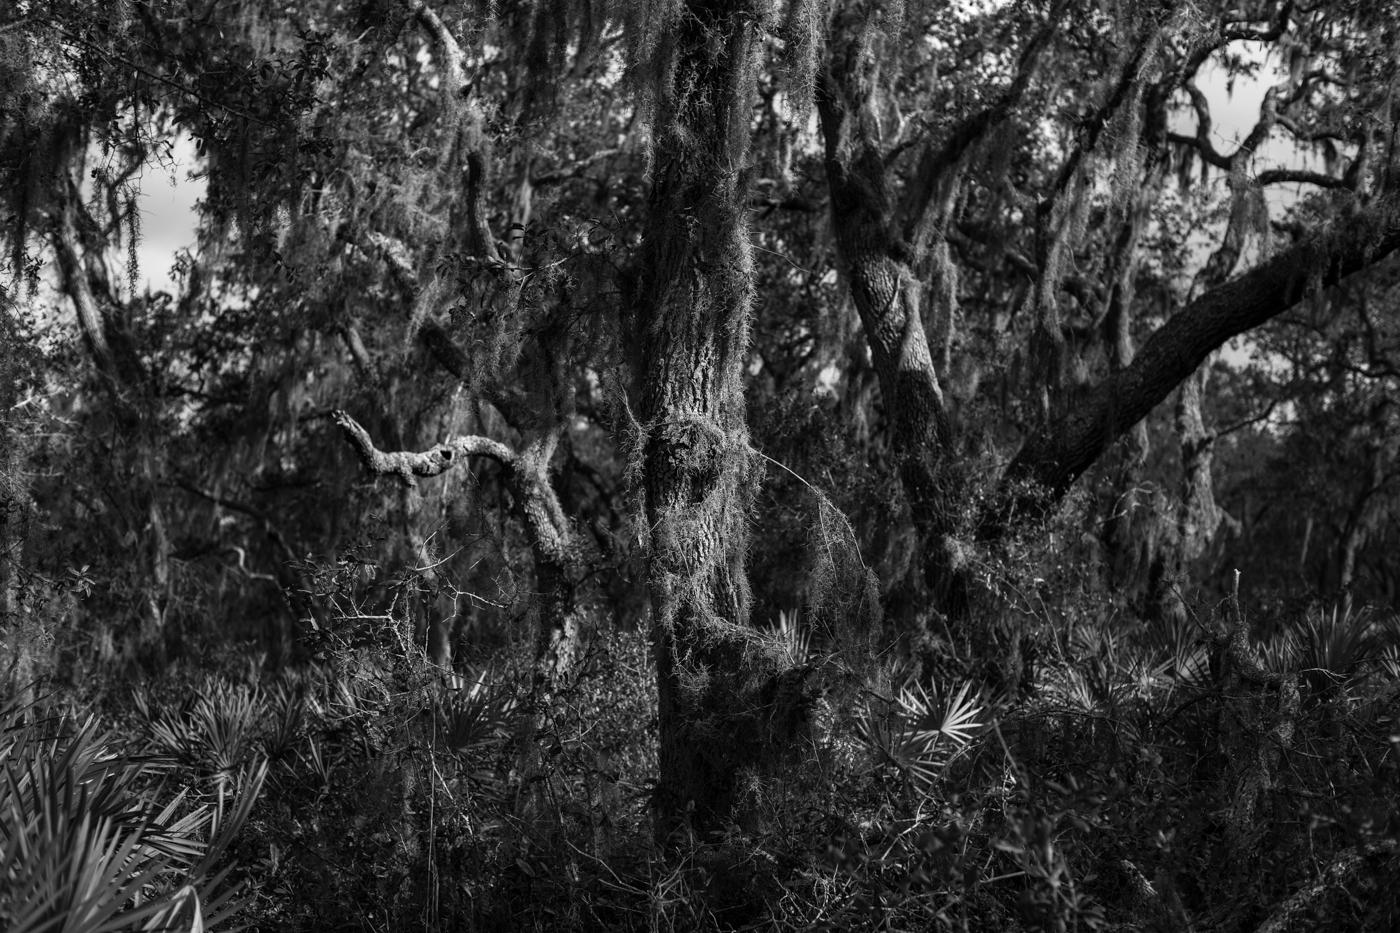 Forest-17.jpg